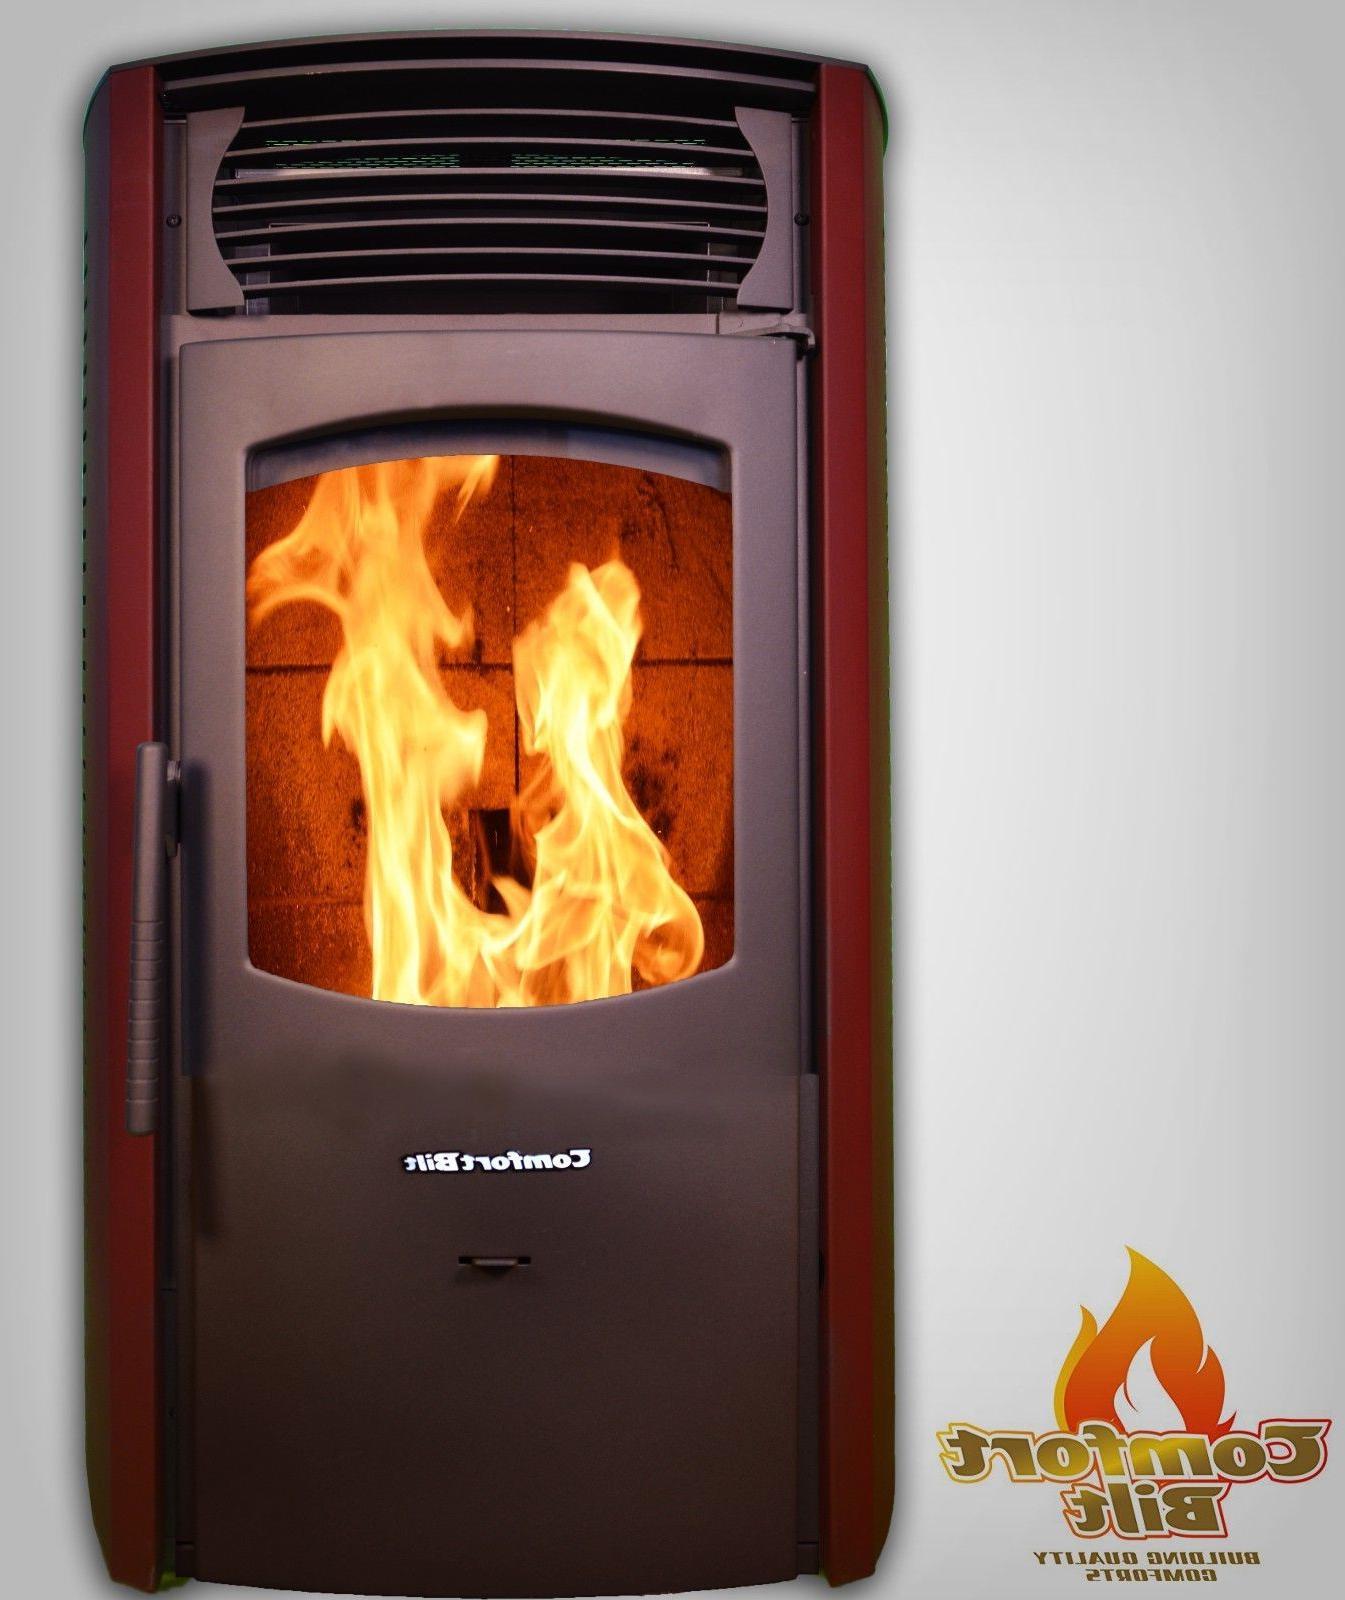 Comfortbilt Pellet Stove/Fireplace 42000btu -HP50-Burgundy-Special